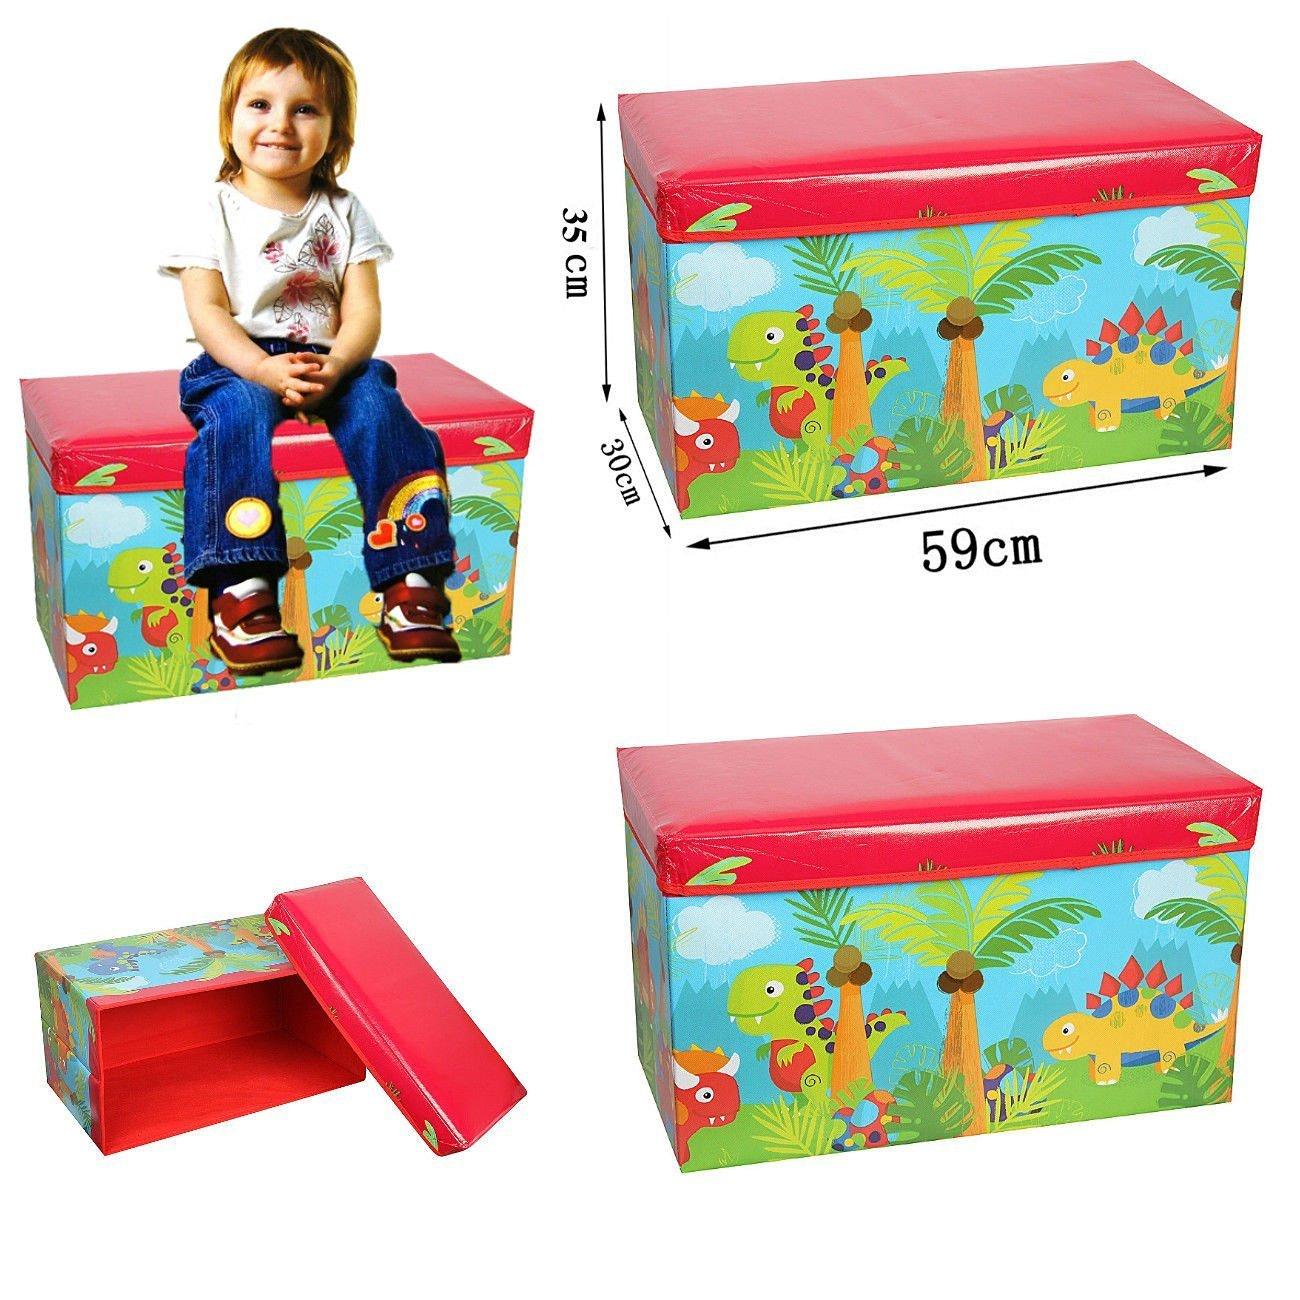 FunkyBuys Kids Toys Books Childrens Lid Tidy Large Storage Box Folding Stool Seat Toy Box Boys Girls Chest Clothes (Dinosaur)